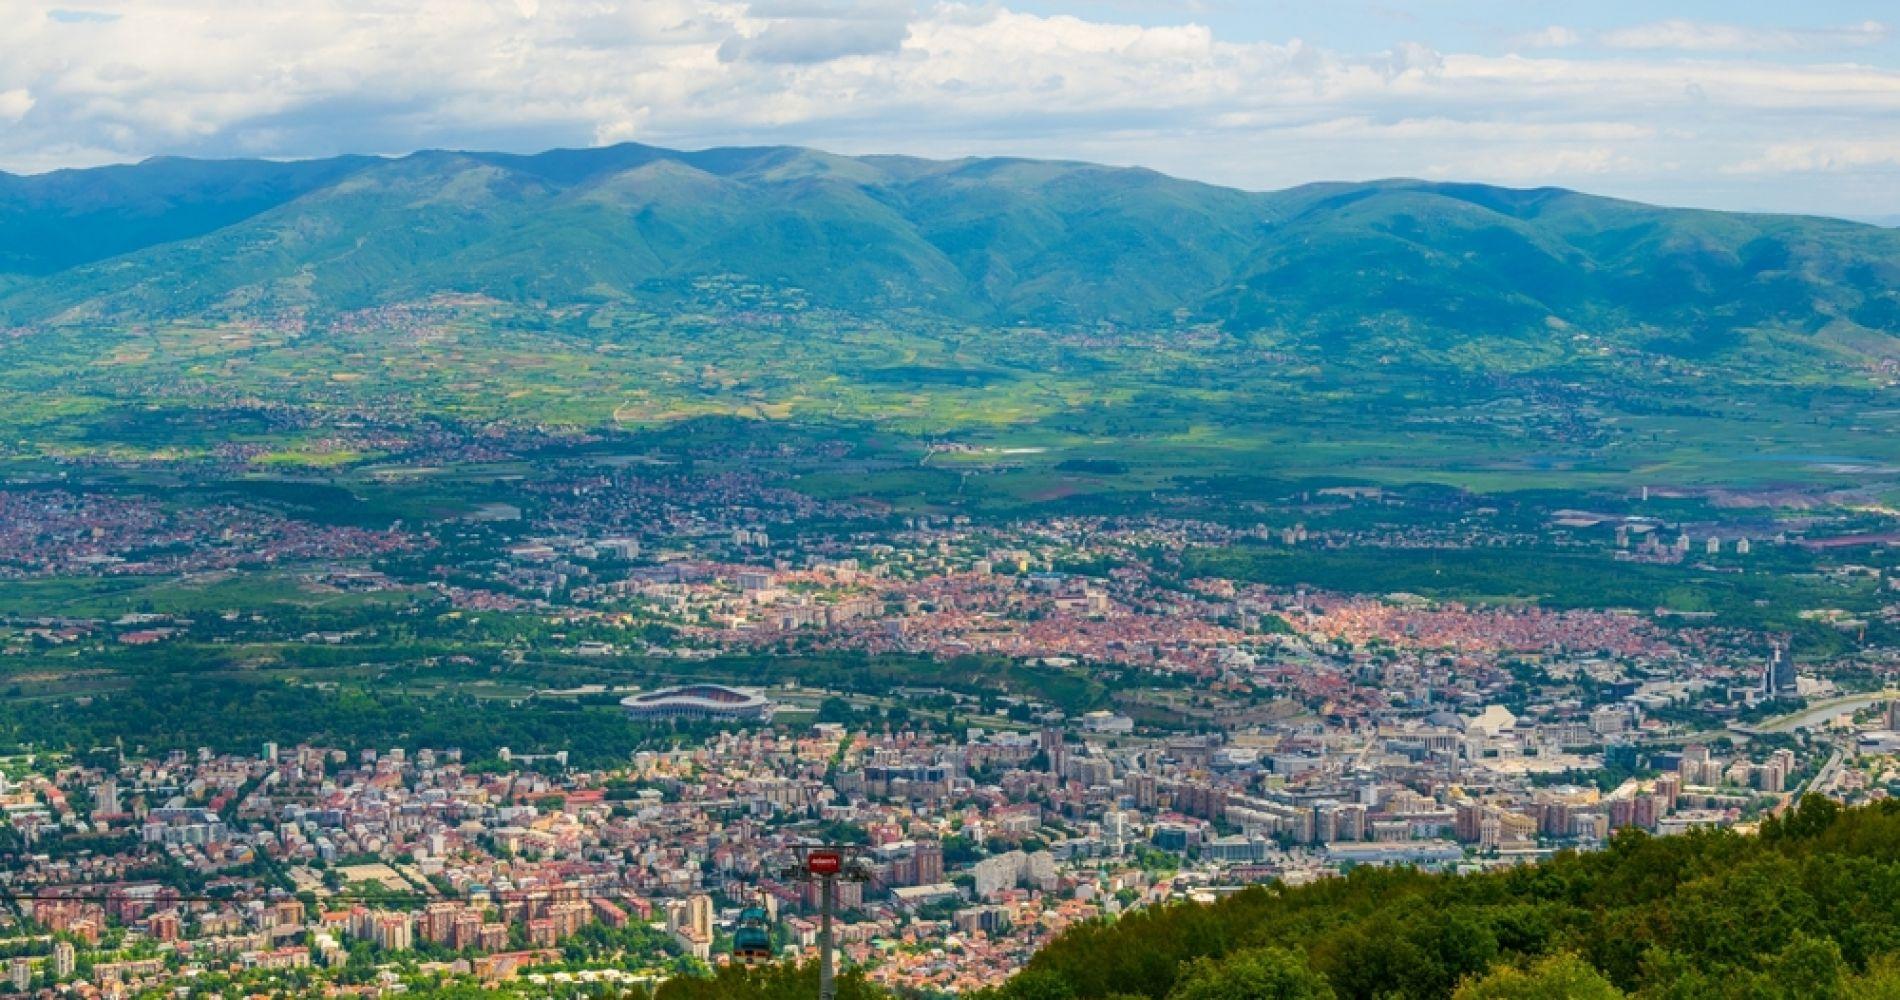 Pipeline-related risks for Skopje'sVodno mountain